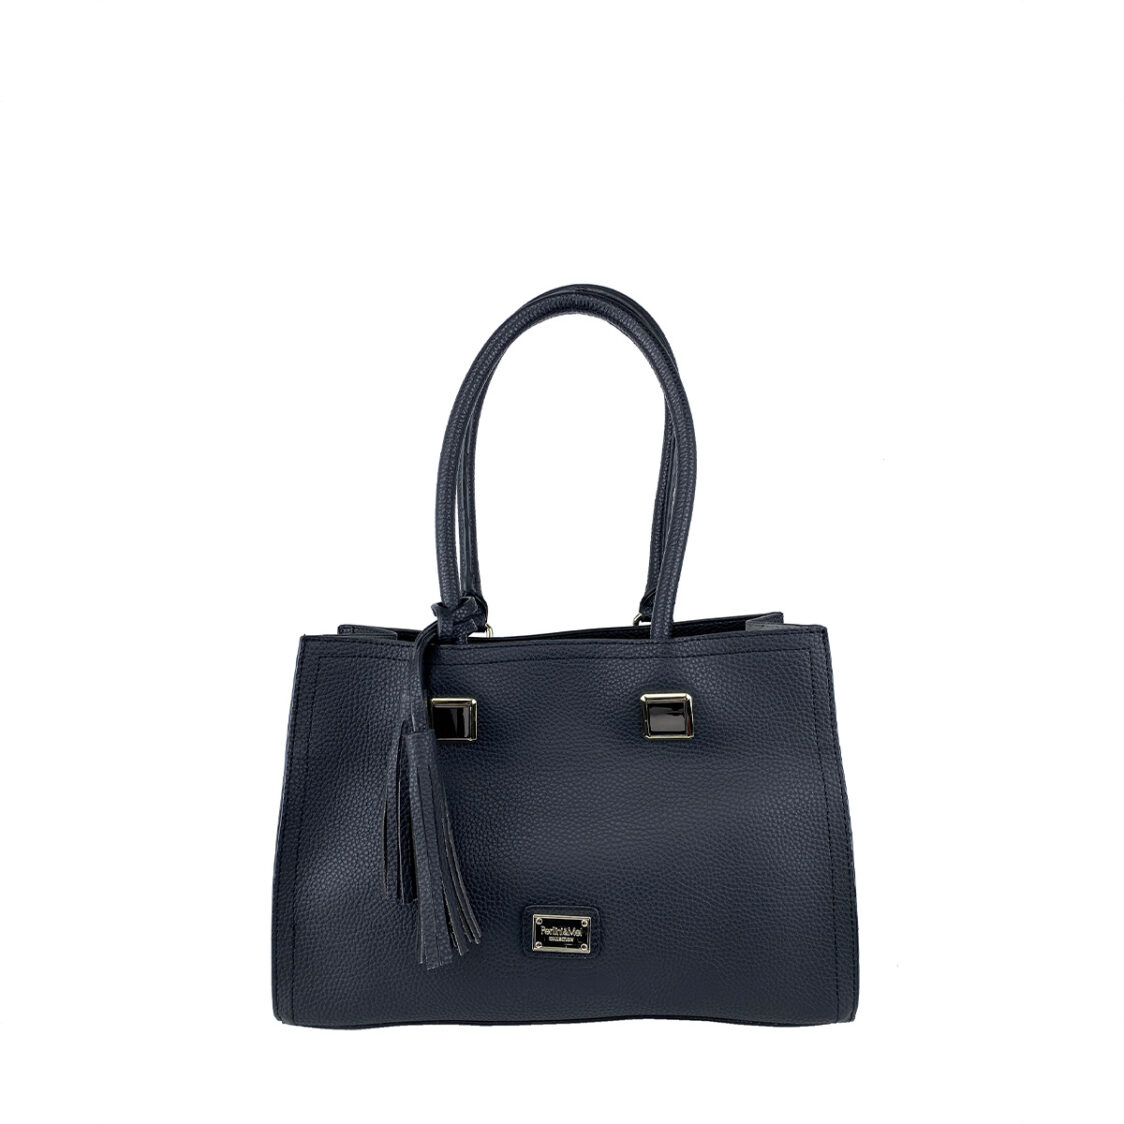 Perllini  Mel Tassel Accent Double Handle Bag Black